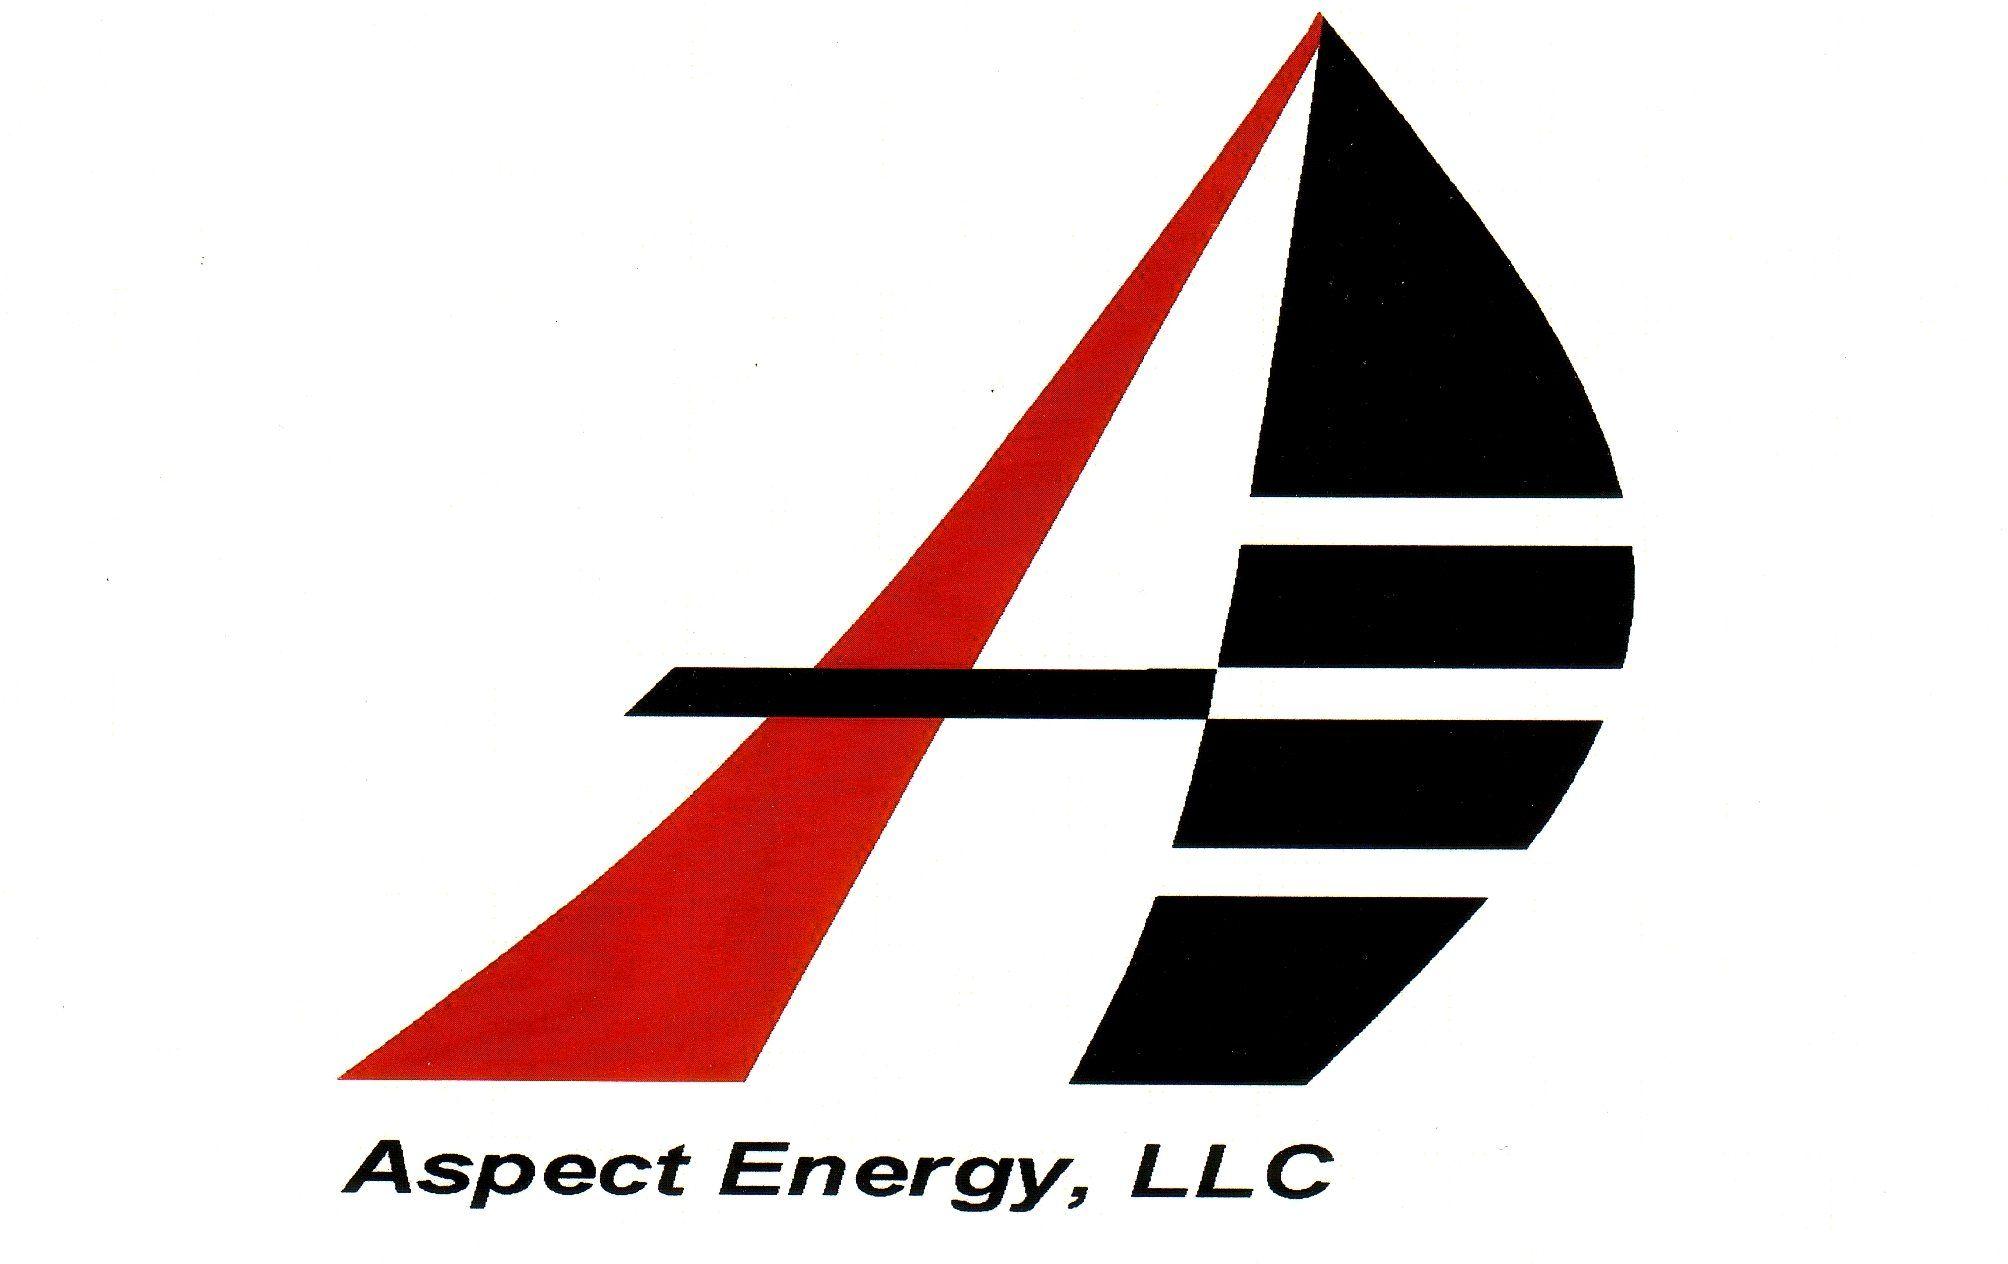 Aspect Energy, LLC